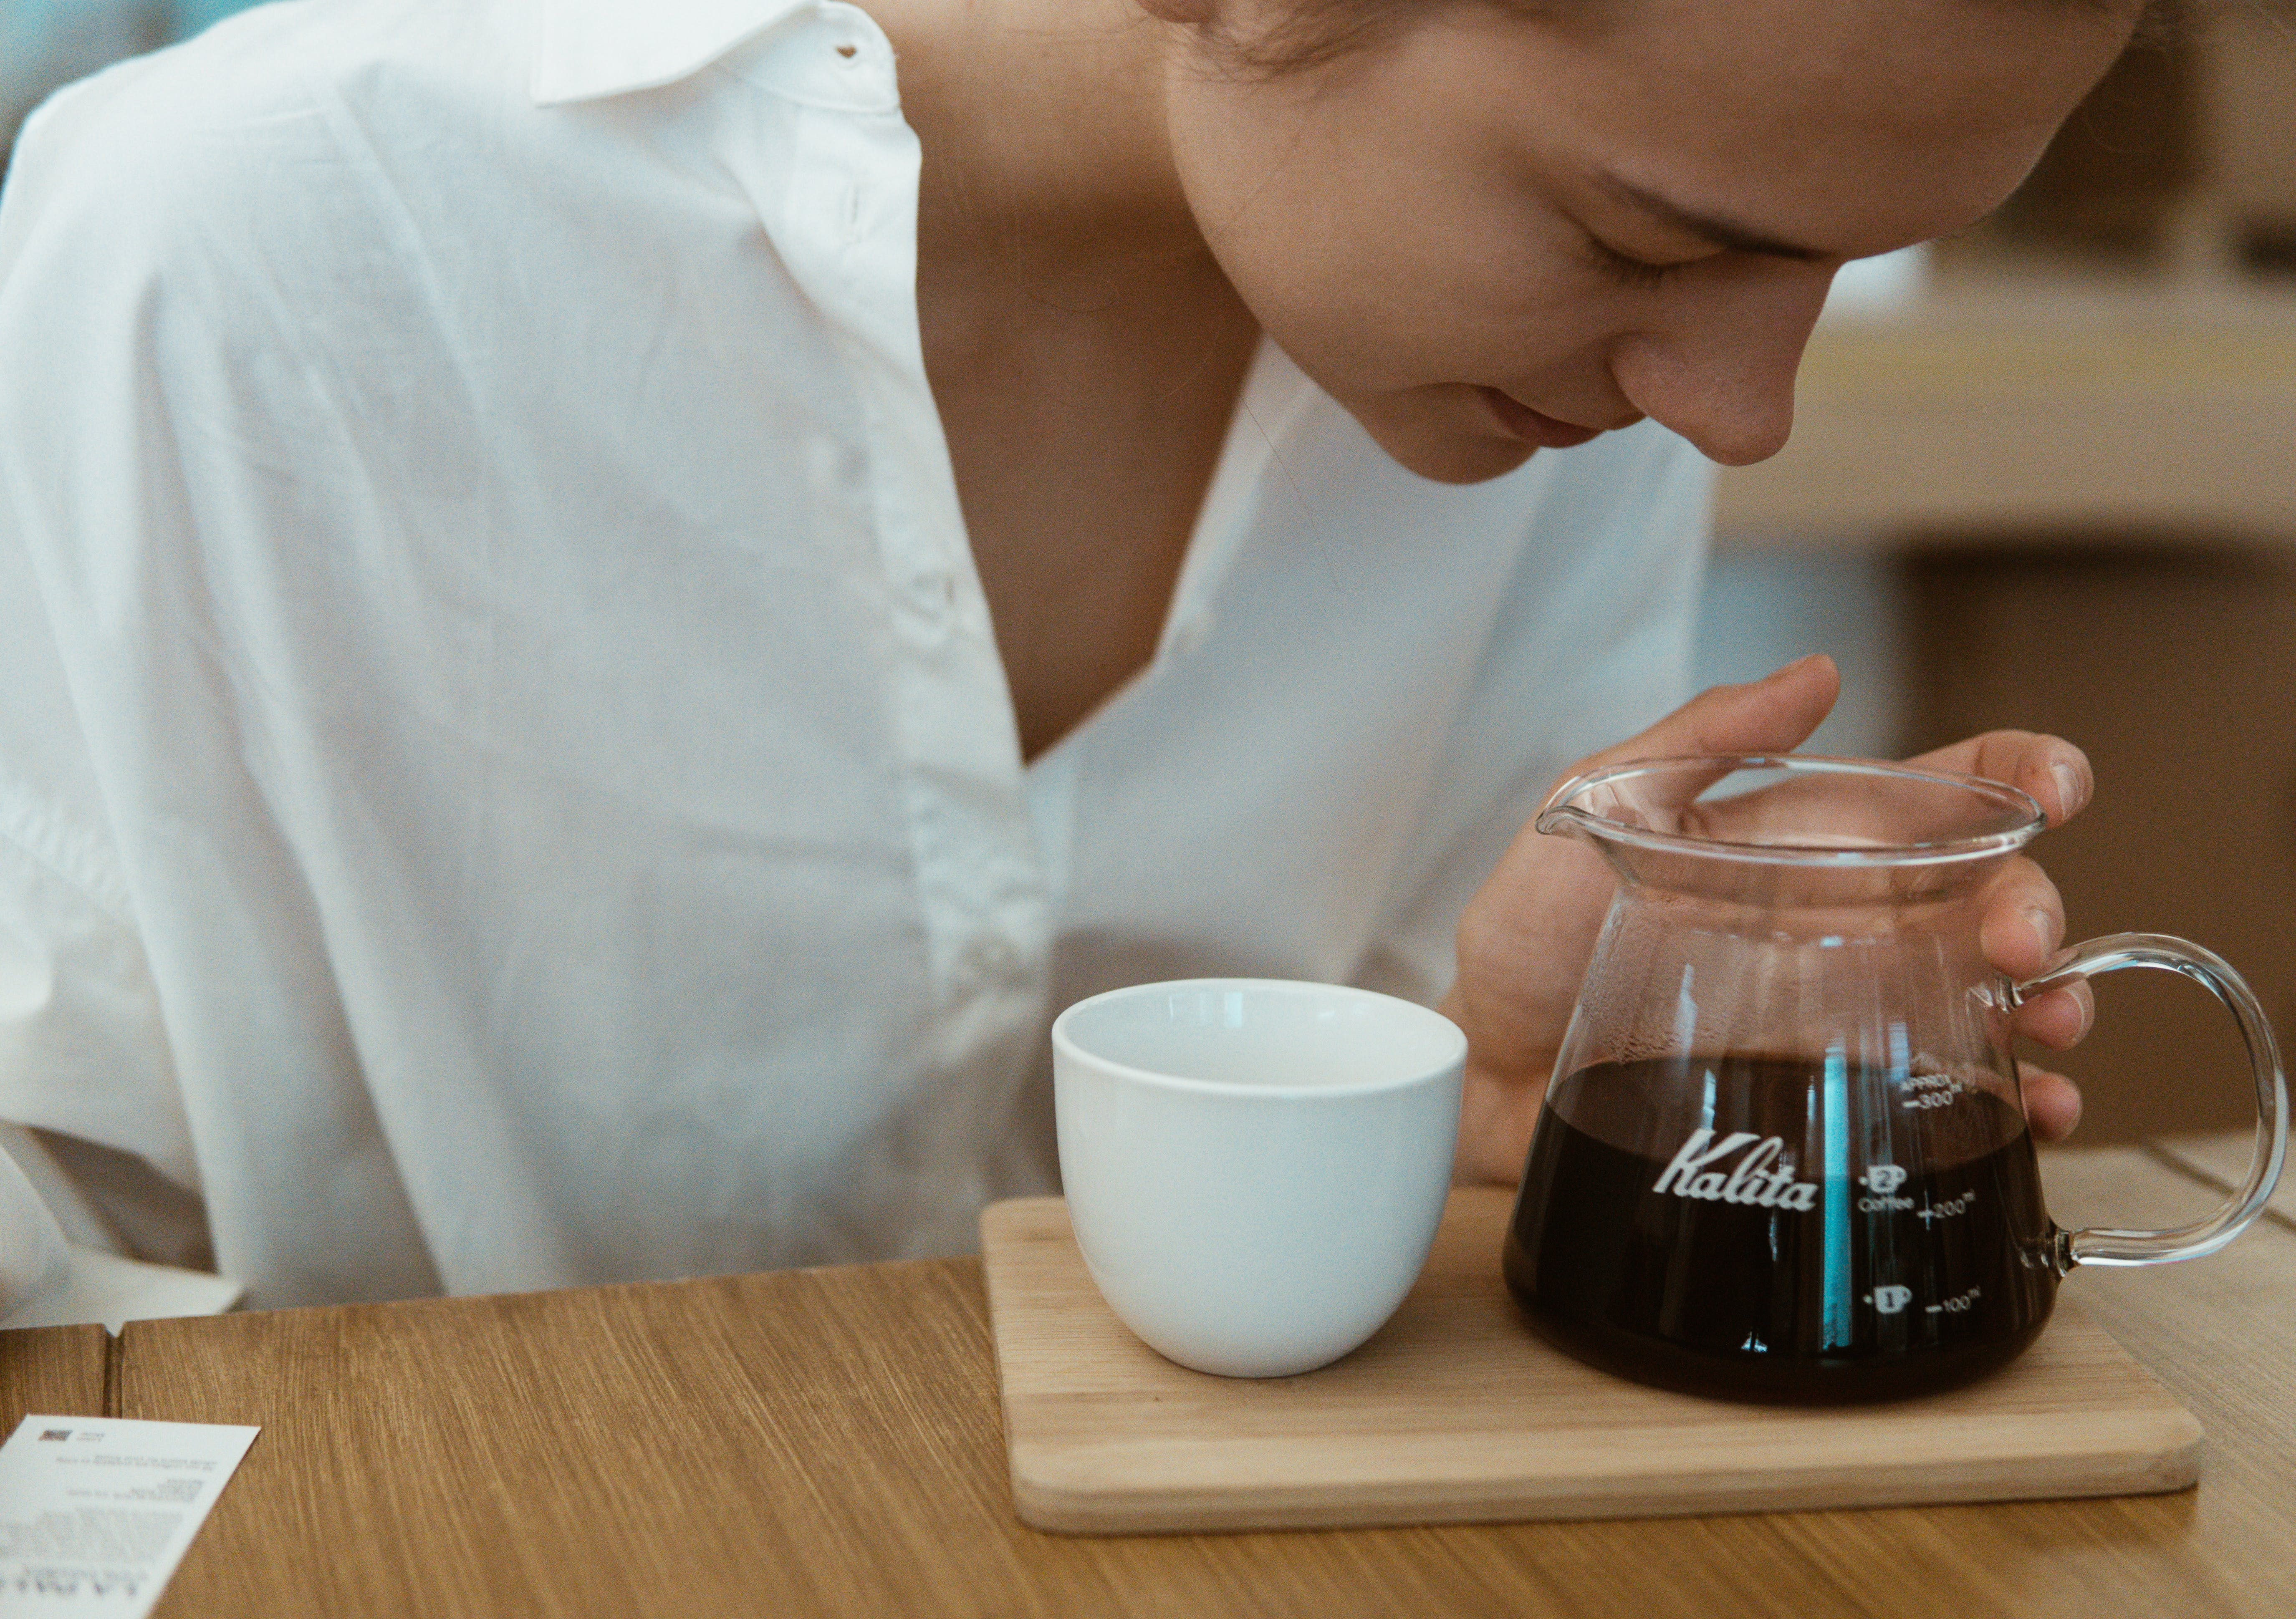 Woman Looking At Black Liquid